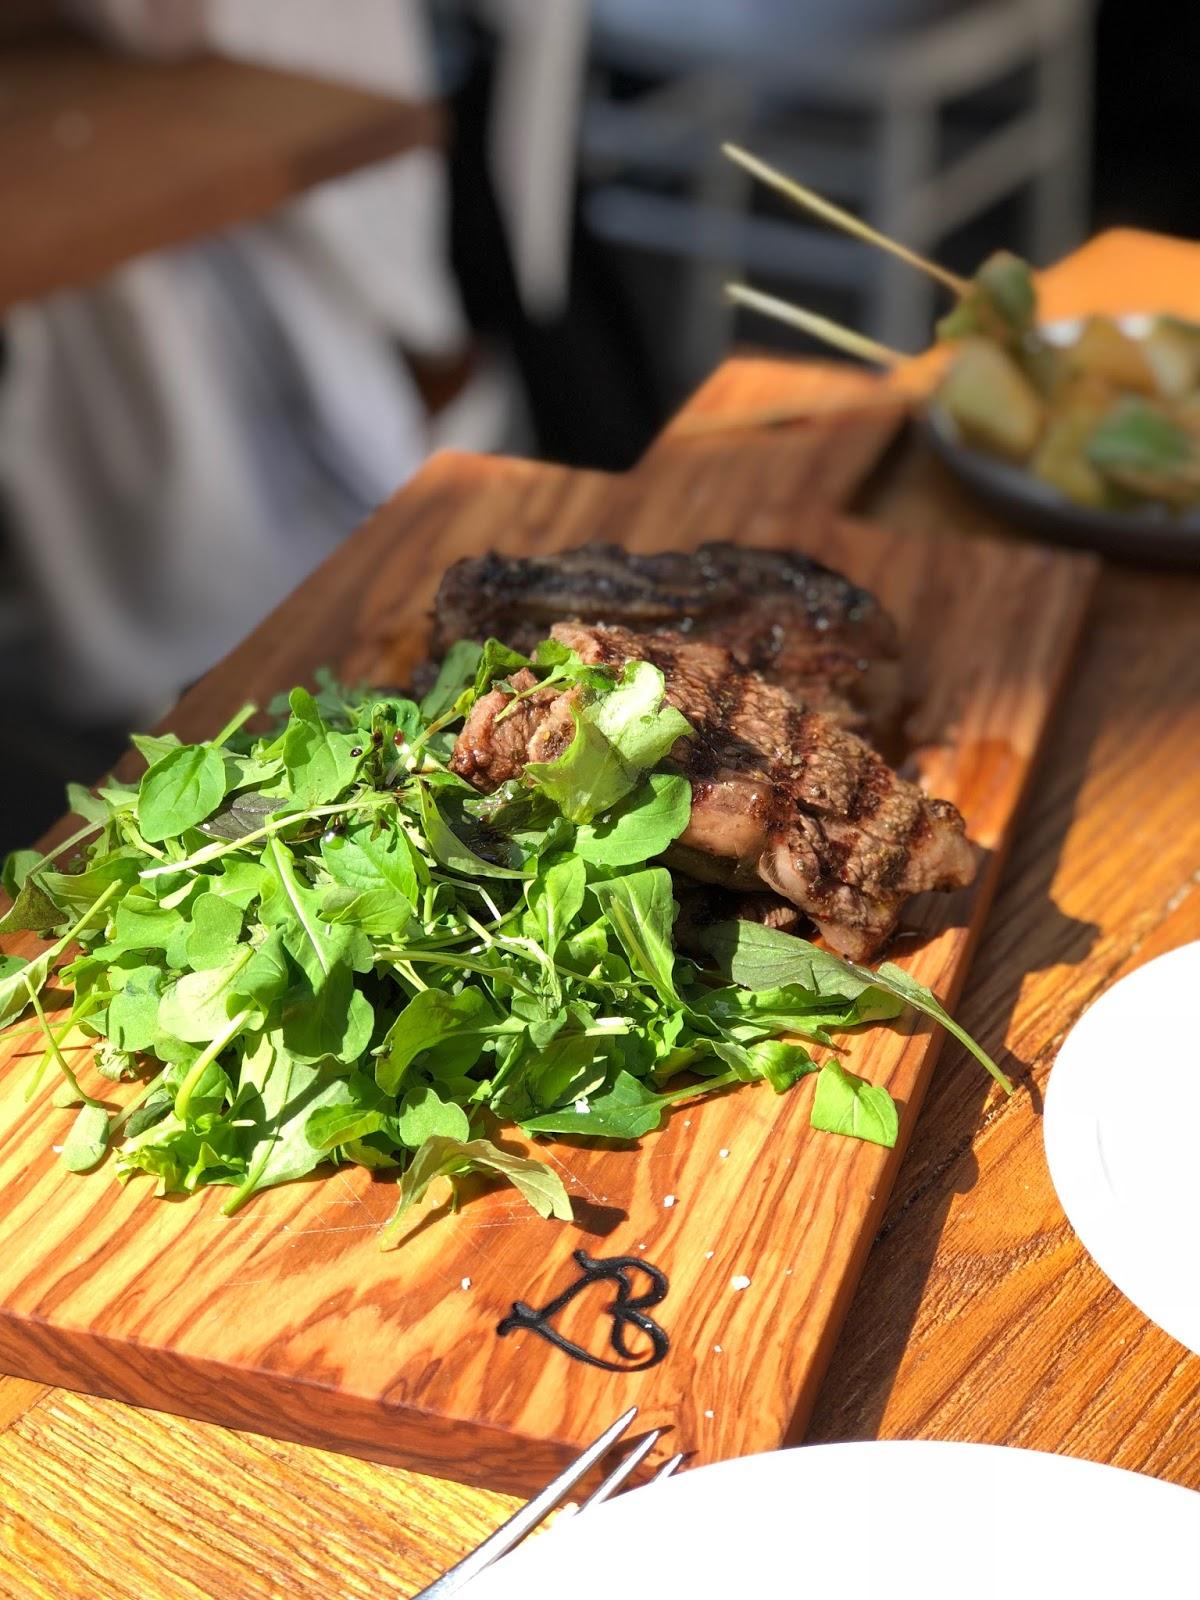 Where to eat in boston,Eataly,restaurants in boston, italian food in boston